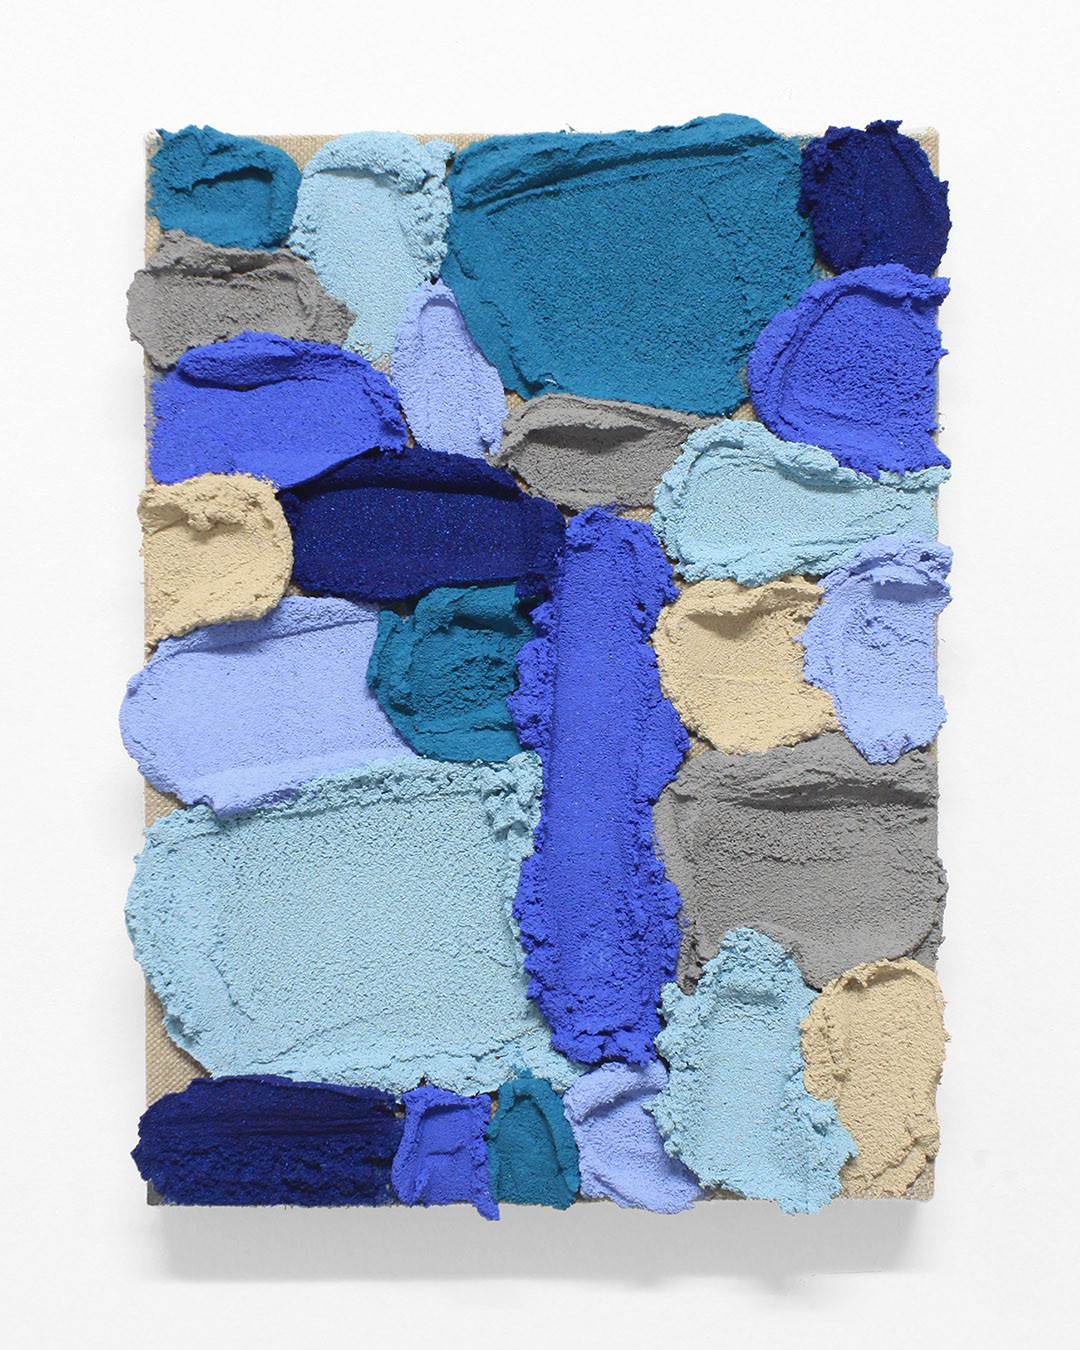 PR30, 2020. Acrylic, sand and limestone on linen. 33 x 24 cm.